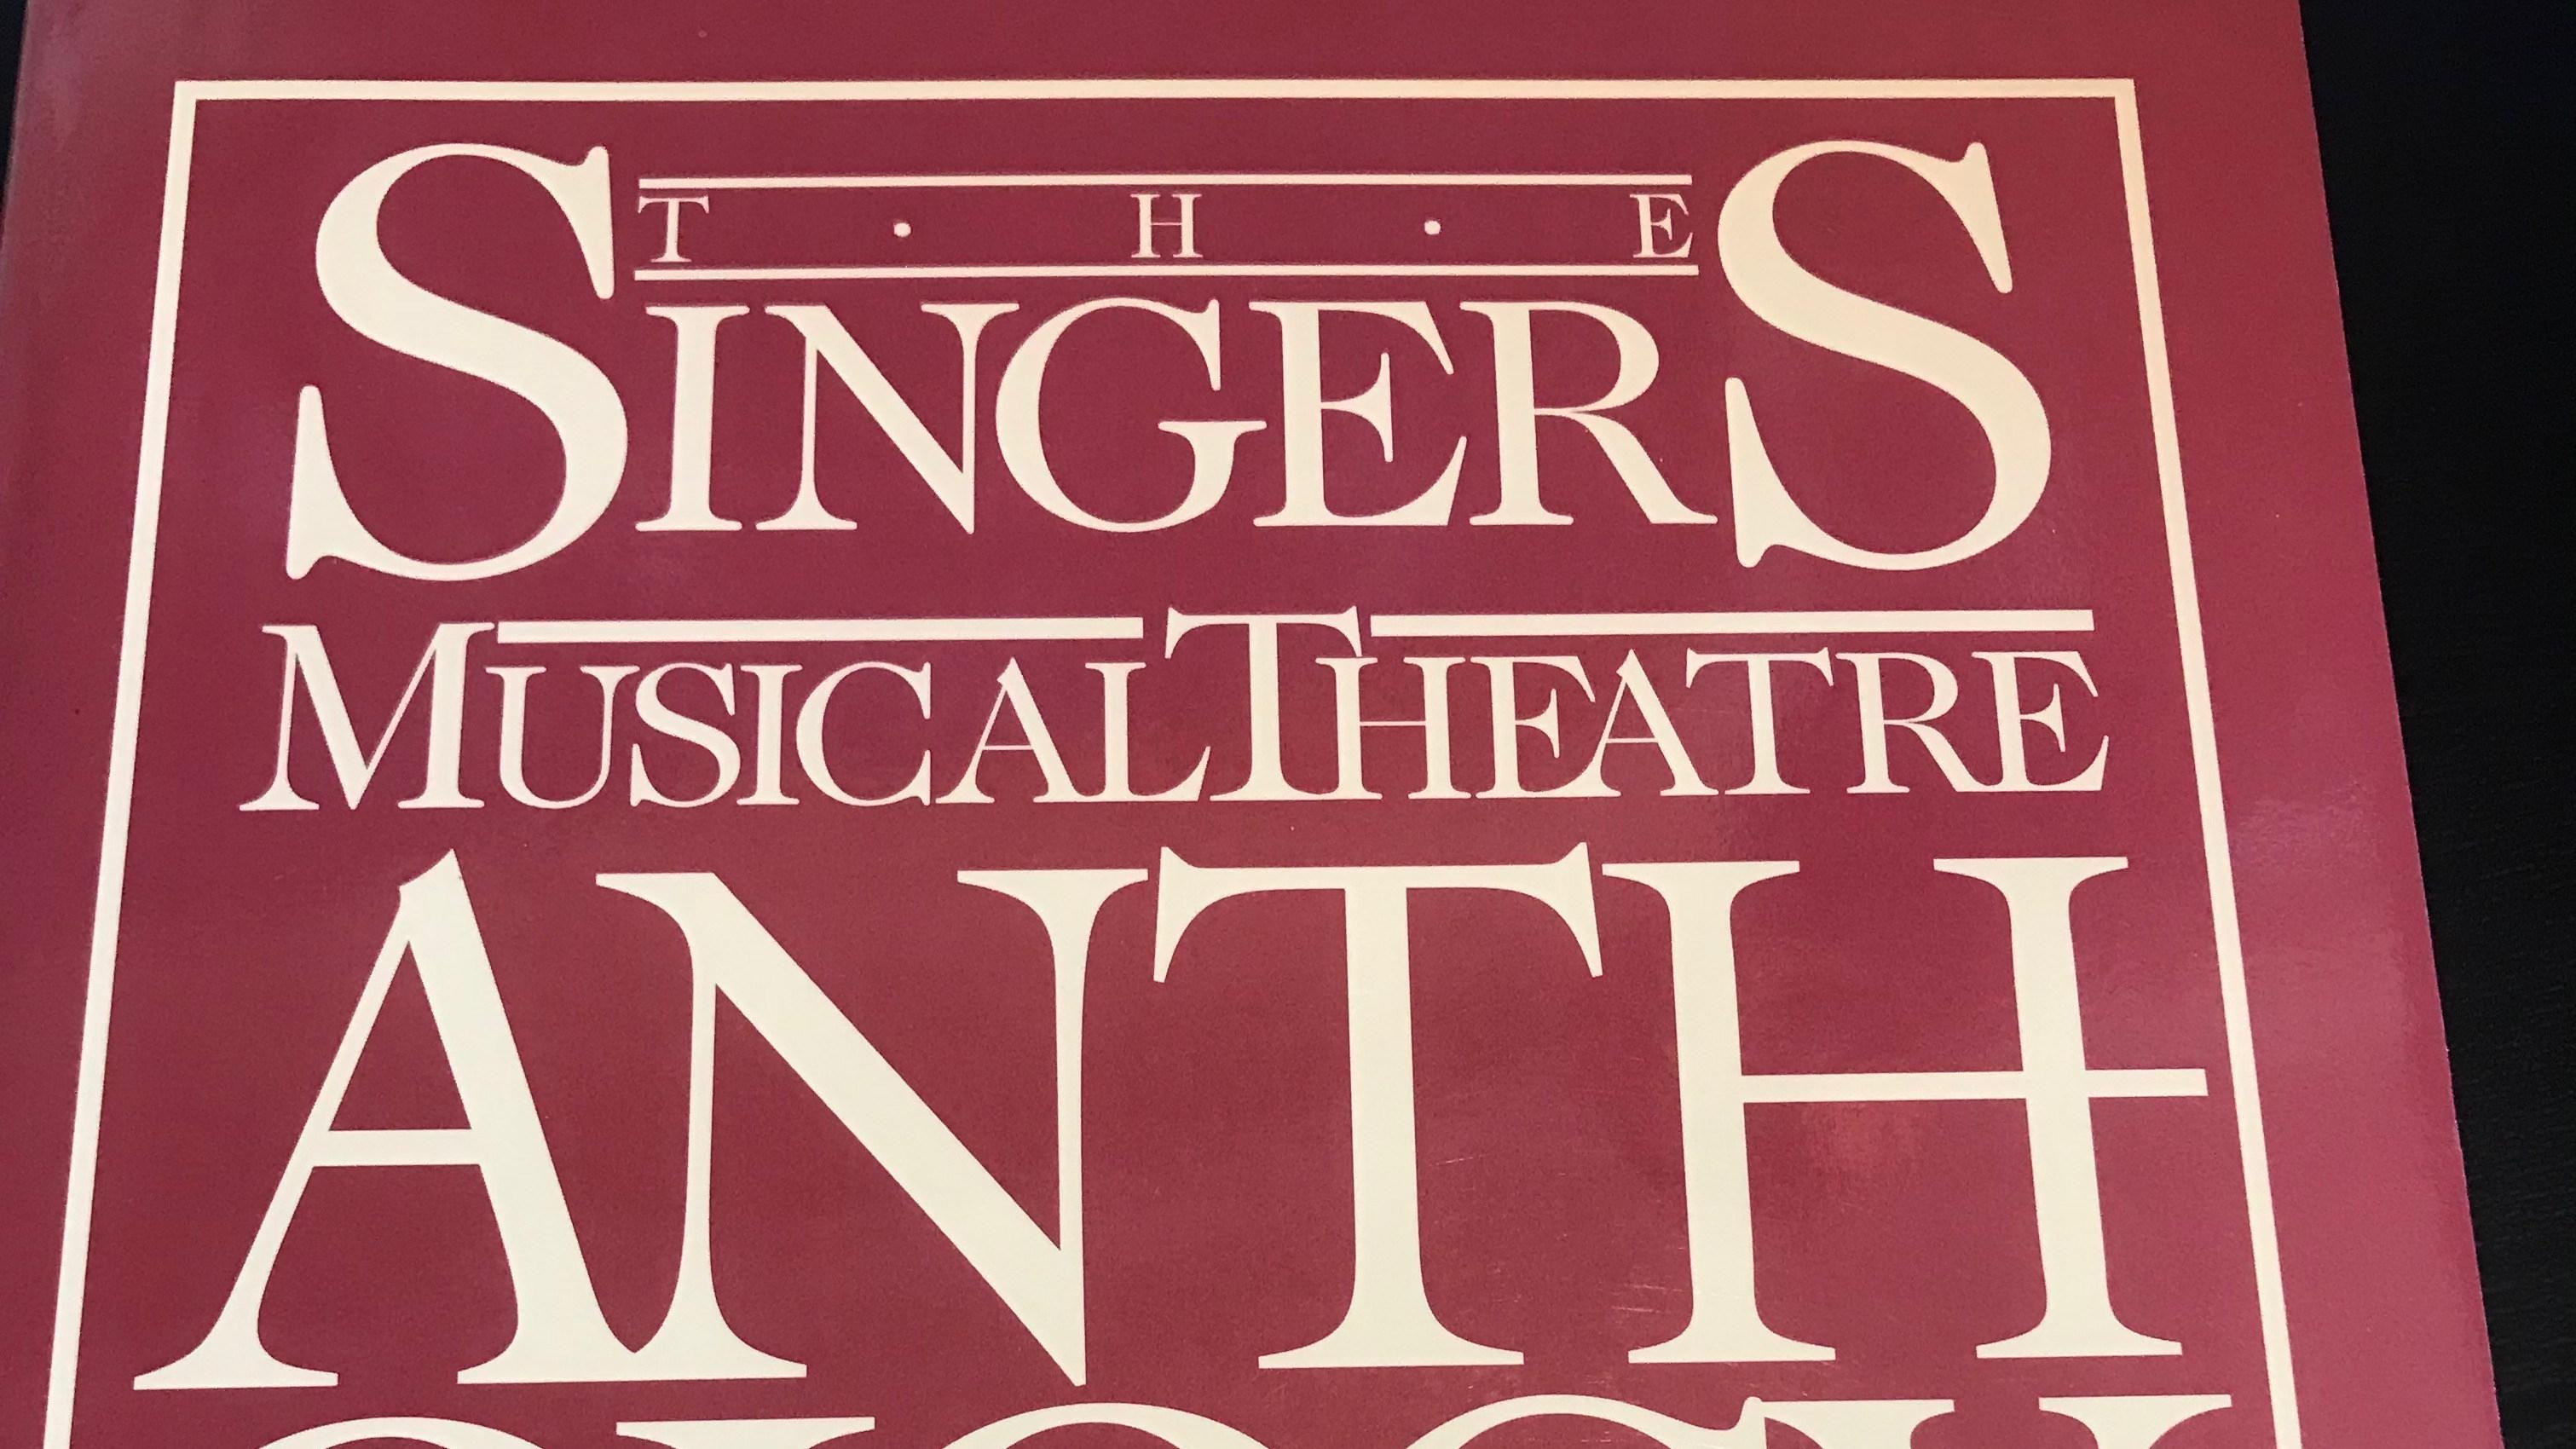 repertoire list – Musical Theatre Resources